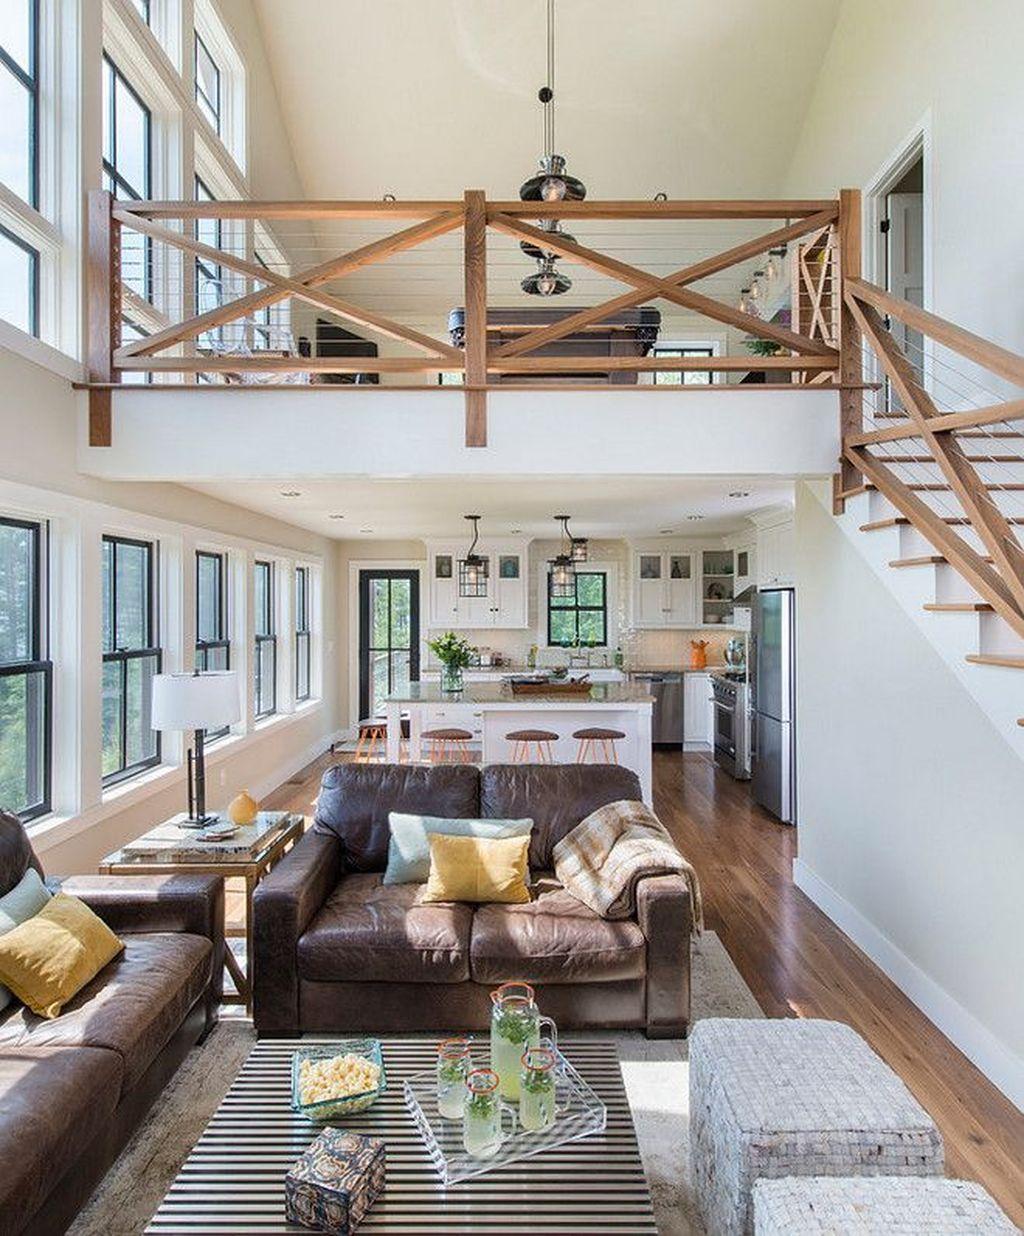 50 stunning interior design ideas with farmhouse style